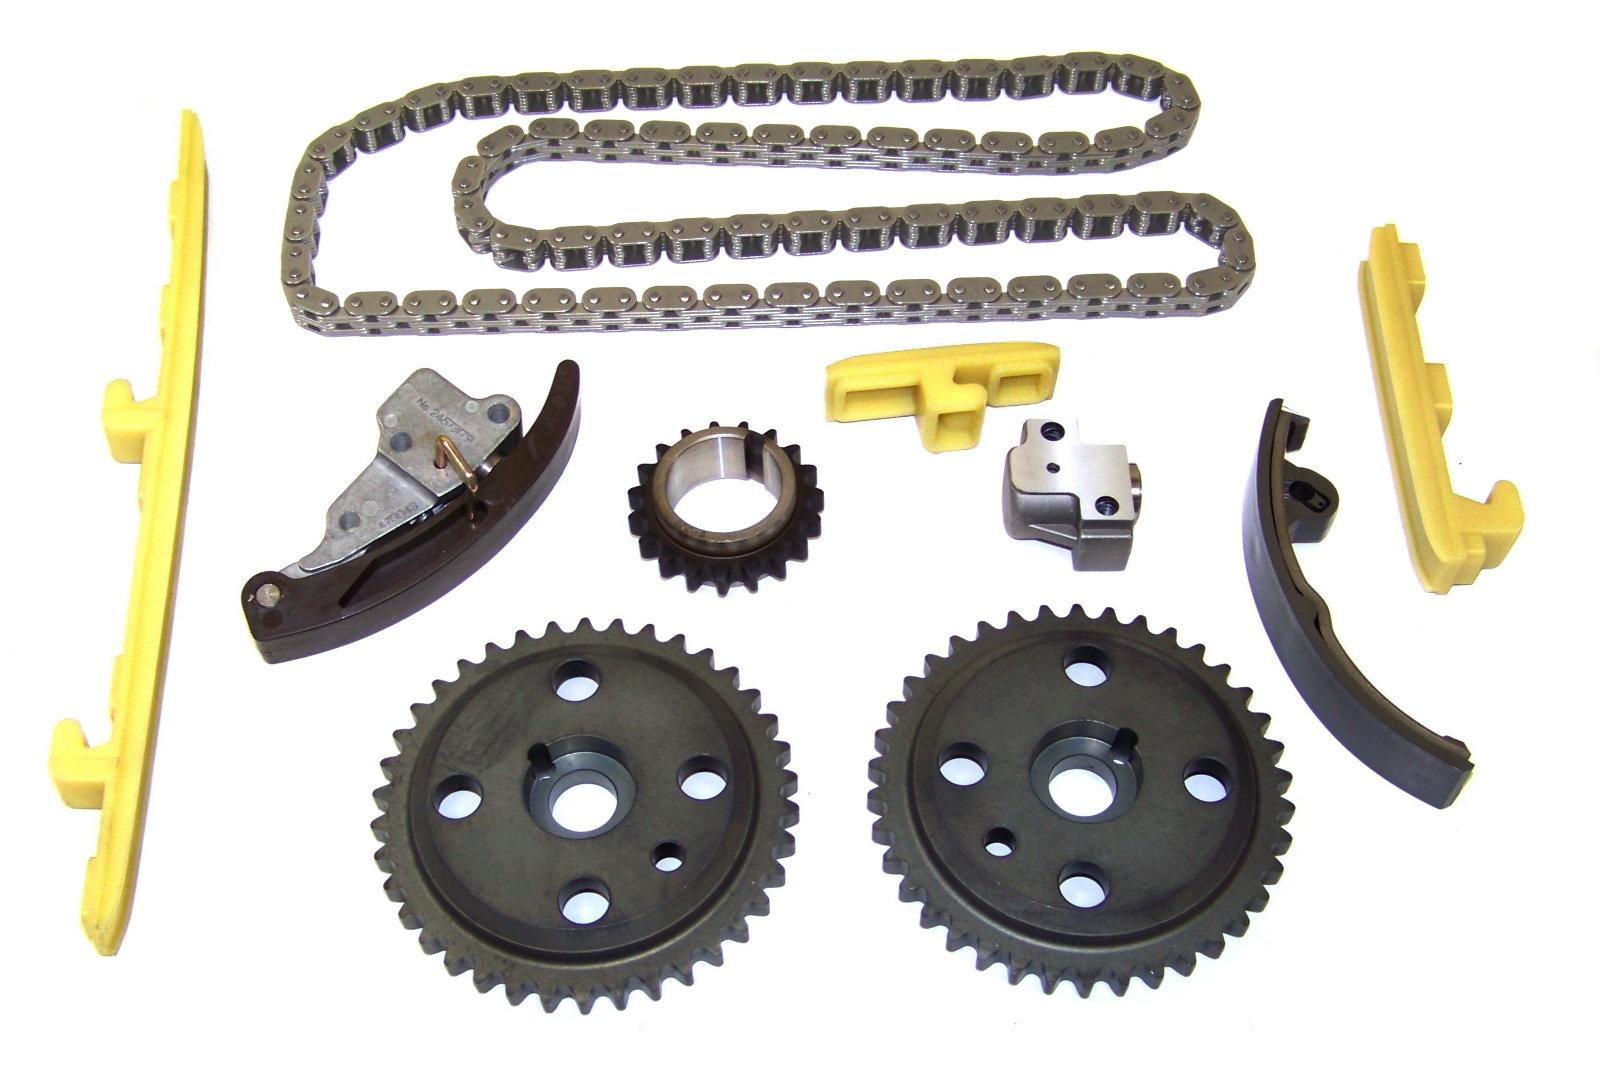 Fits 1996~2001 Oldsmobile Alero And Achieva 2.4 Liter DOHC - Timing Chain  Set